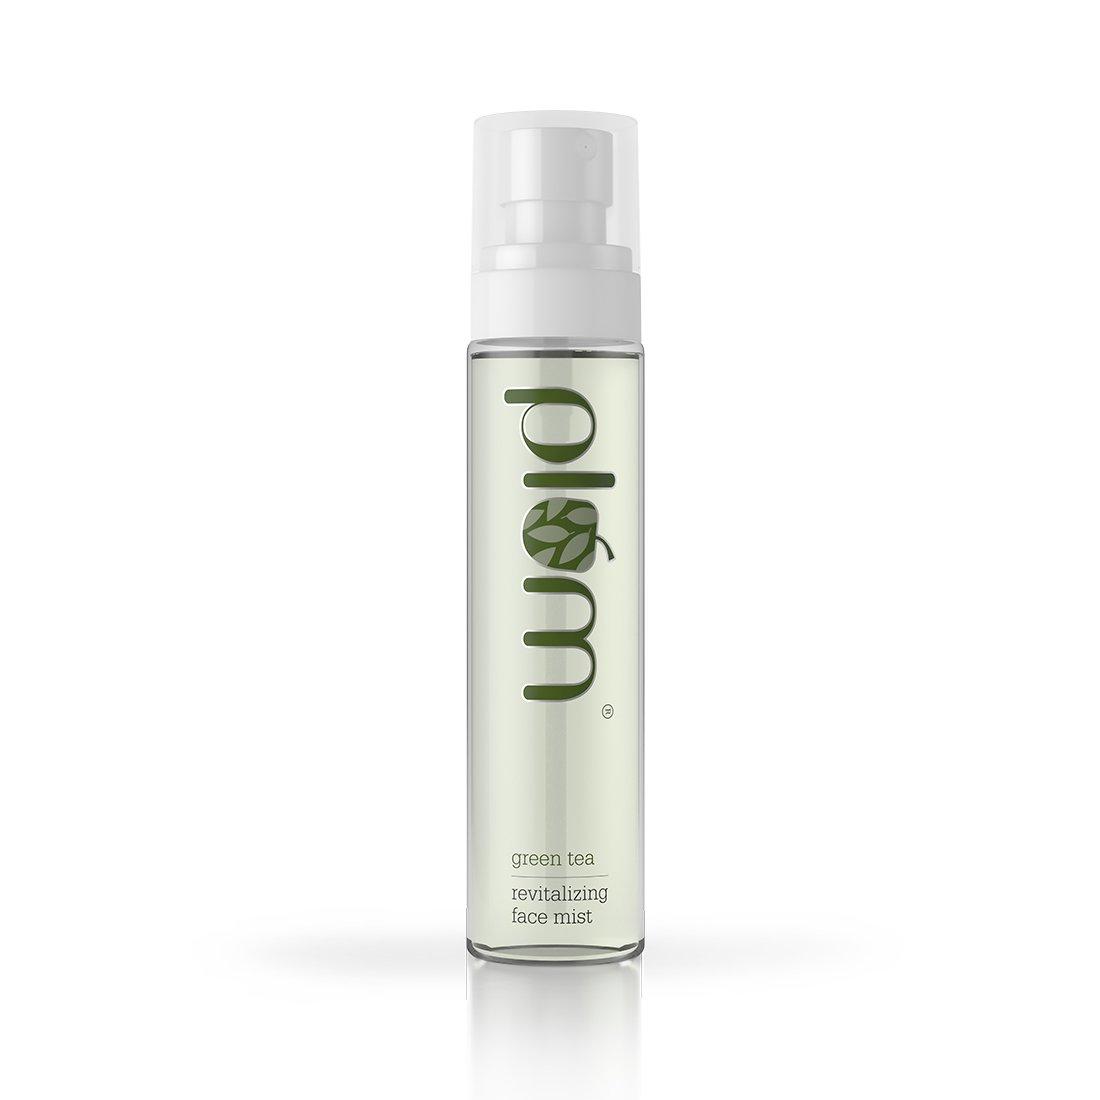 Buy Plum Green Tea Revitalizing Face Mist | Normal, Oily, Acne-Prone,  Combination Skin | Make-up Setting Spray | Green Tea | Aloe Vera | 100%  Vegan | Phthalate Free | Paraben Free |